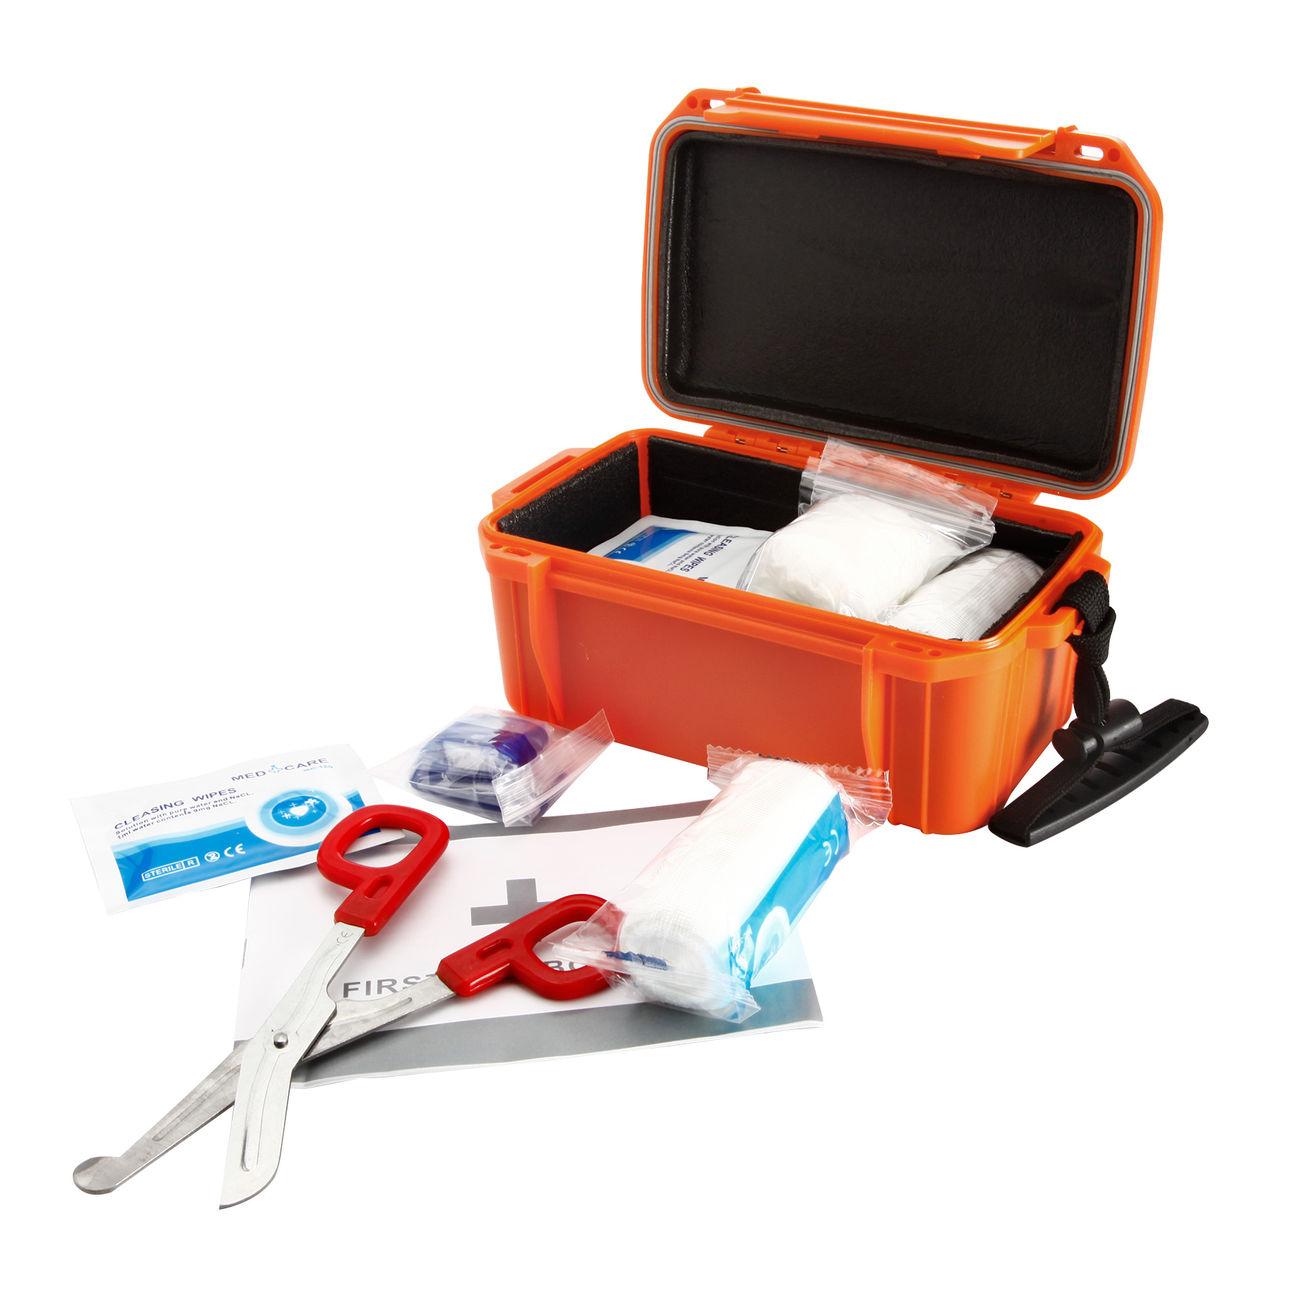 mil tec erste hilfe box camping first aid kit wasserdicht orange g nstig kaufen kotte zeller. Black Bedroom Furniture Sets. Home Design Ideas